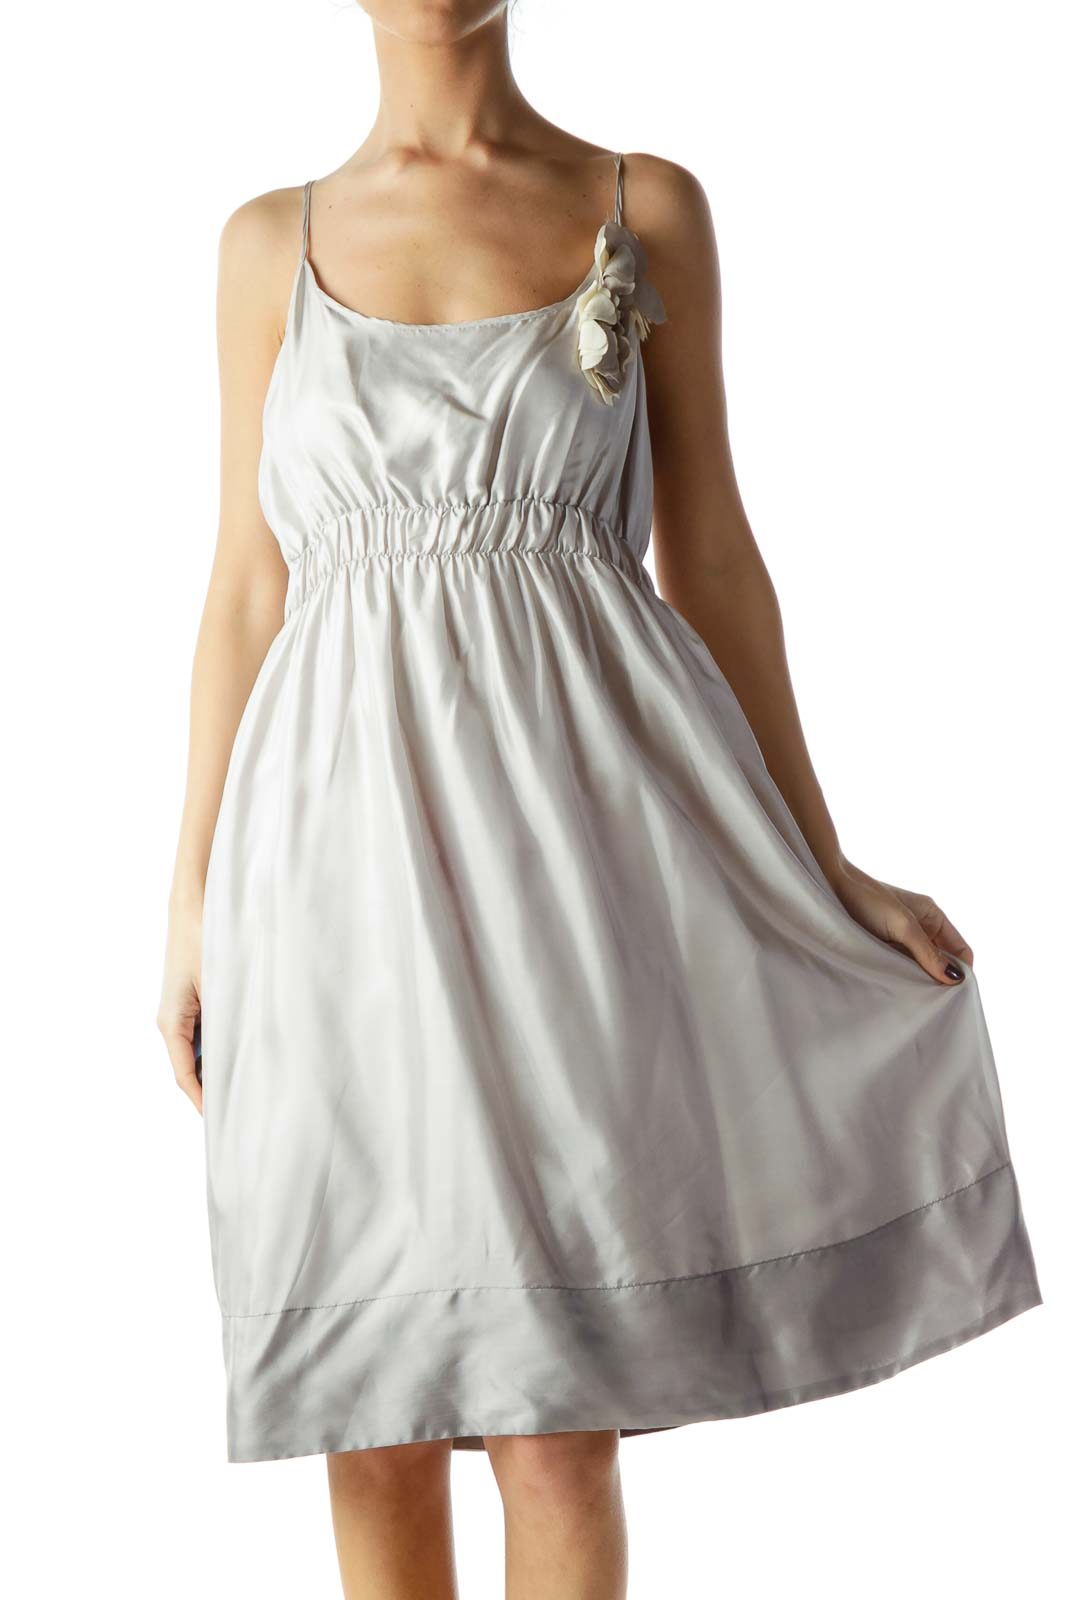 Gray Cream Side Flower Detail 100% Silk Dress Front